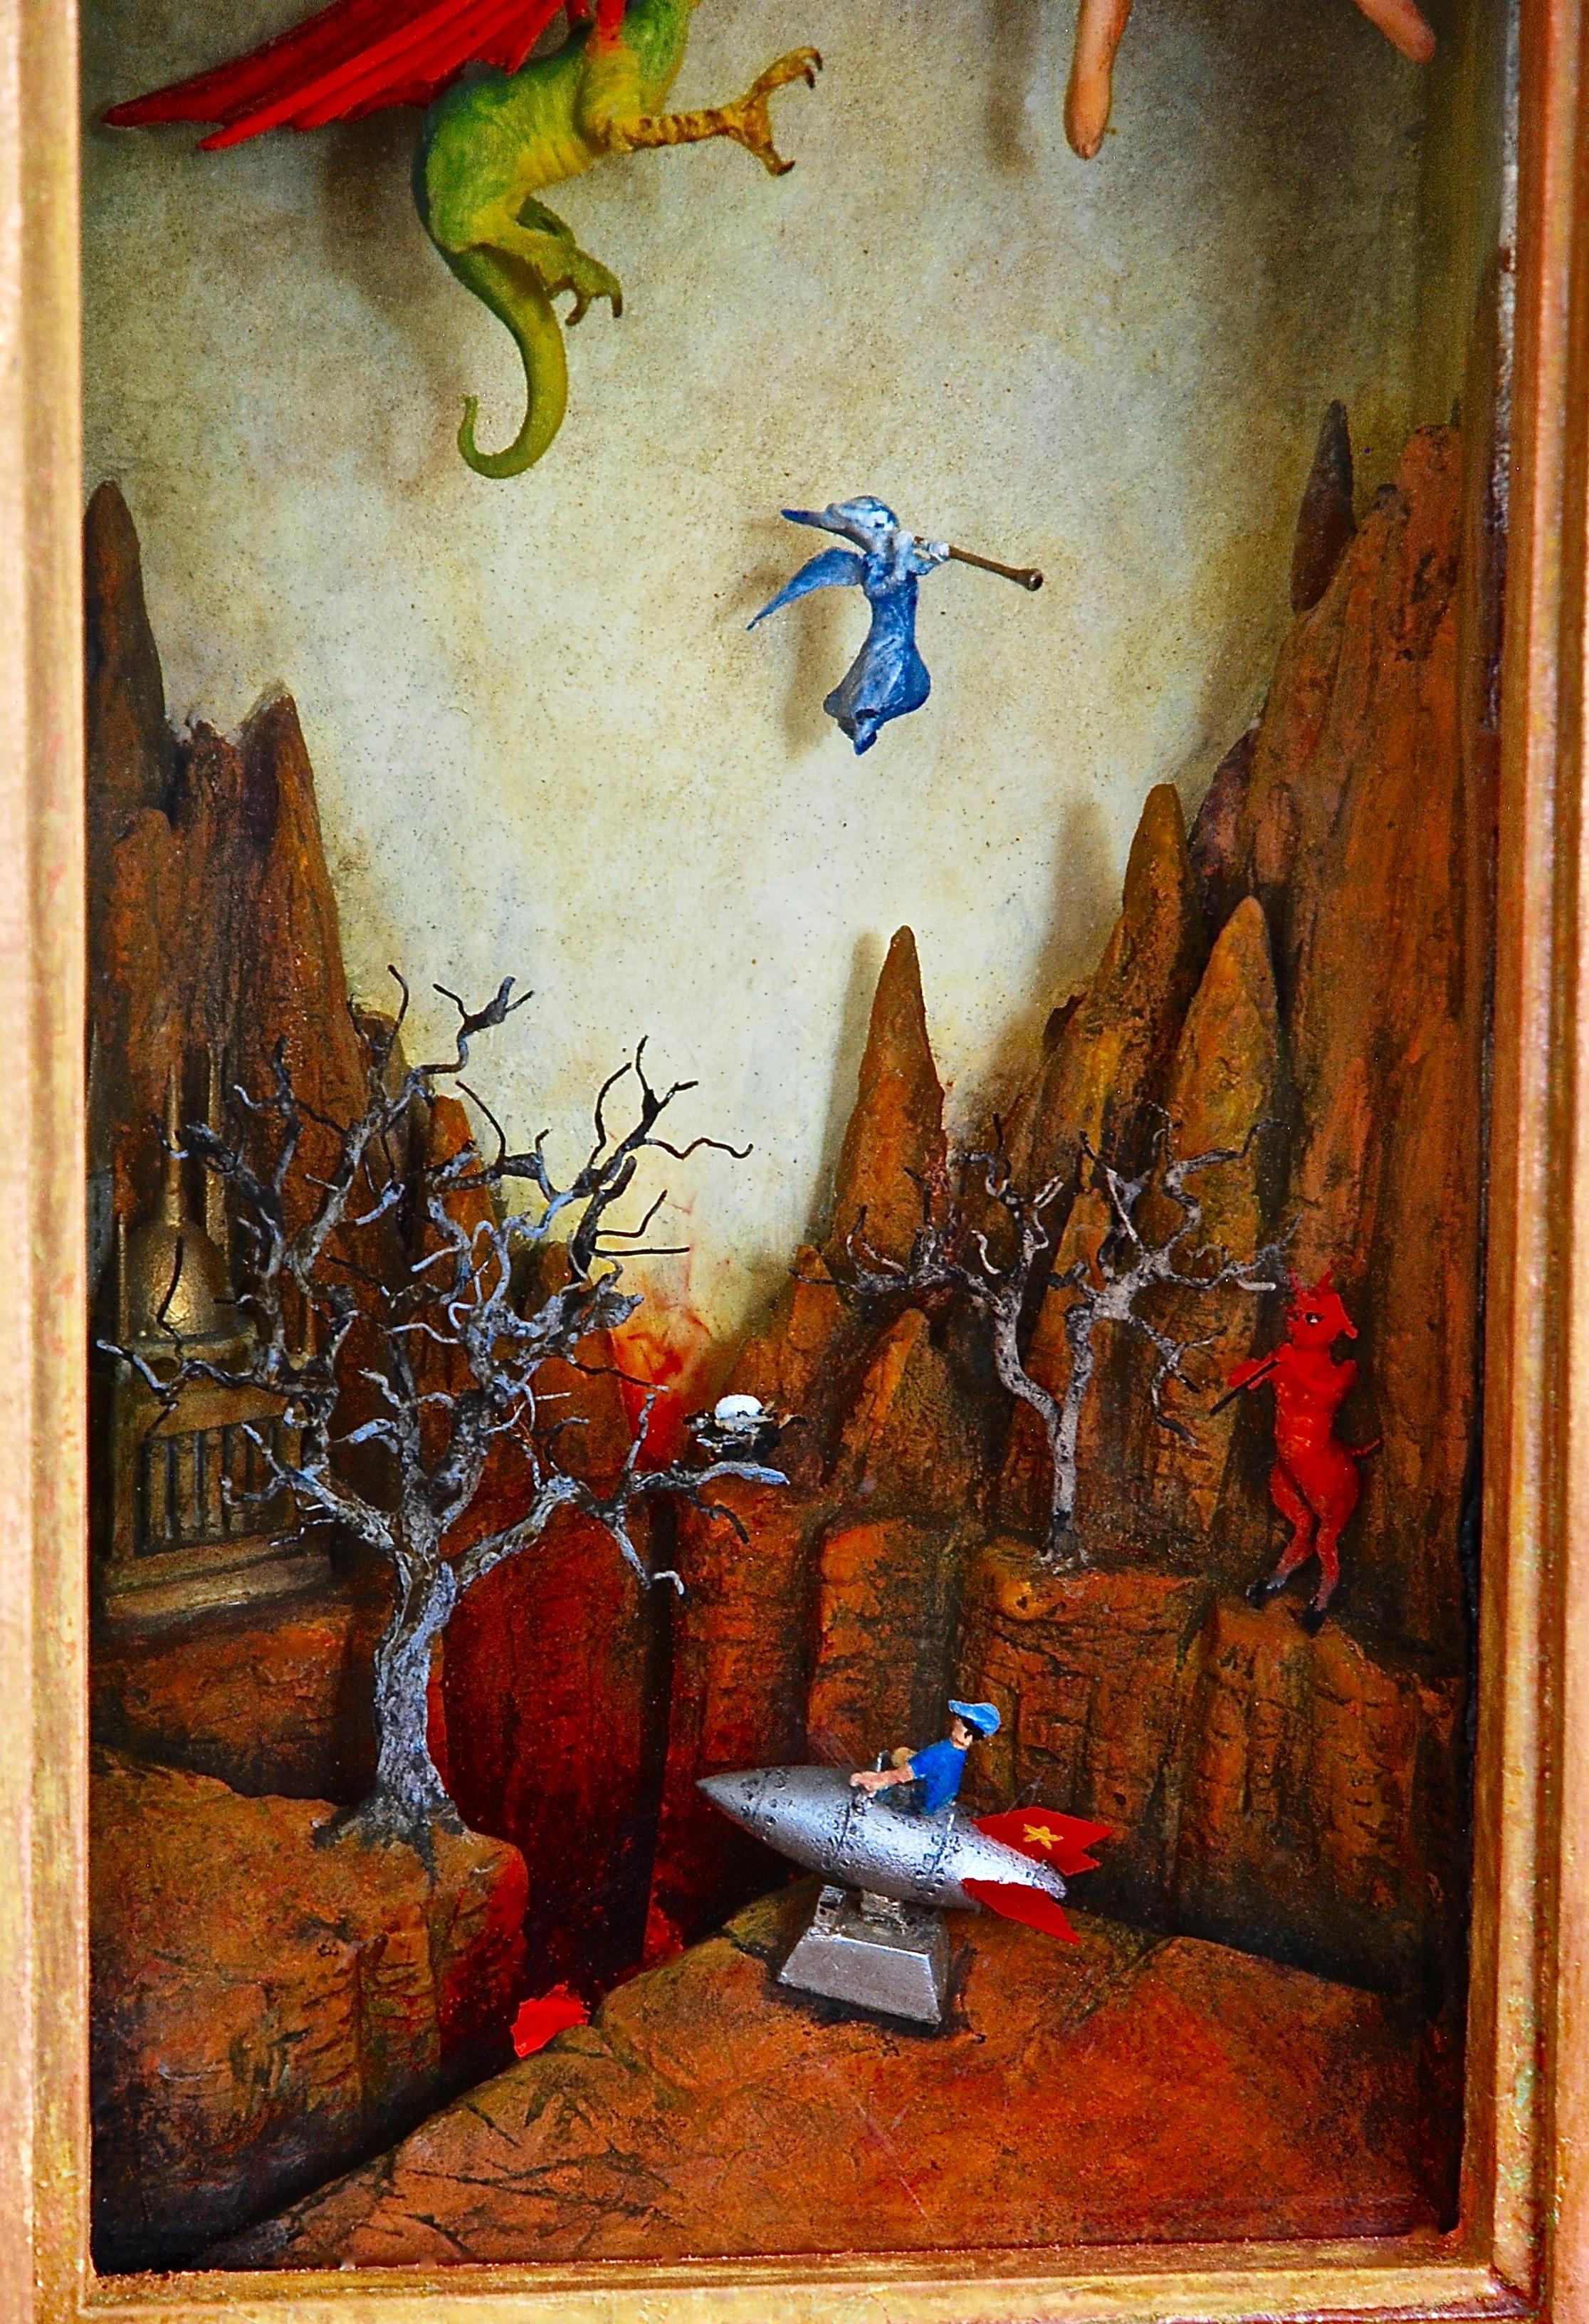 Thomas Coffin - Little Johnny's Rocket Ride (detail)